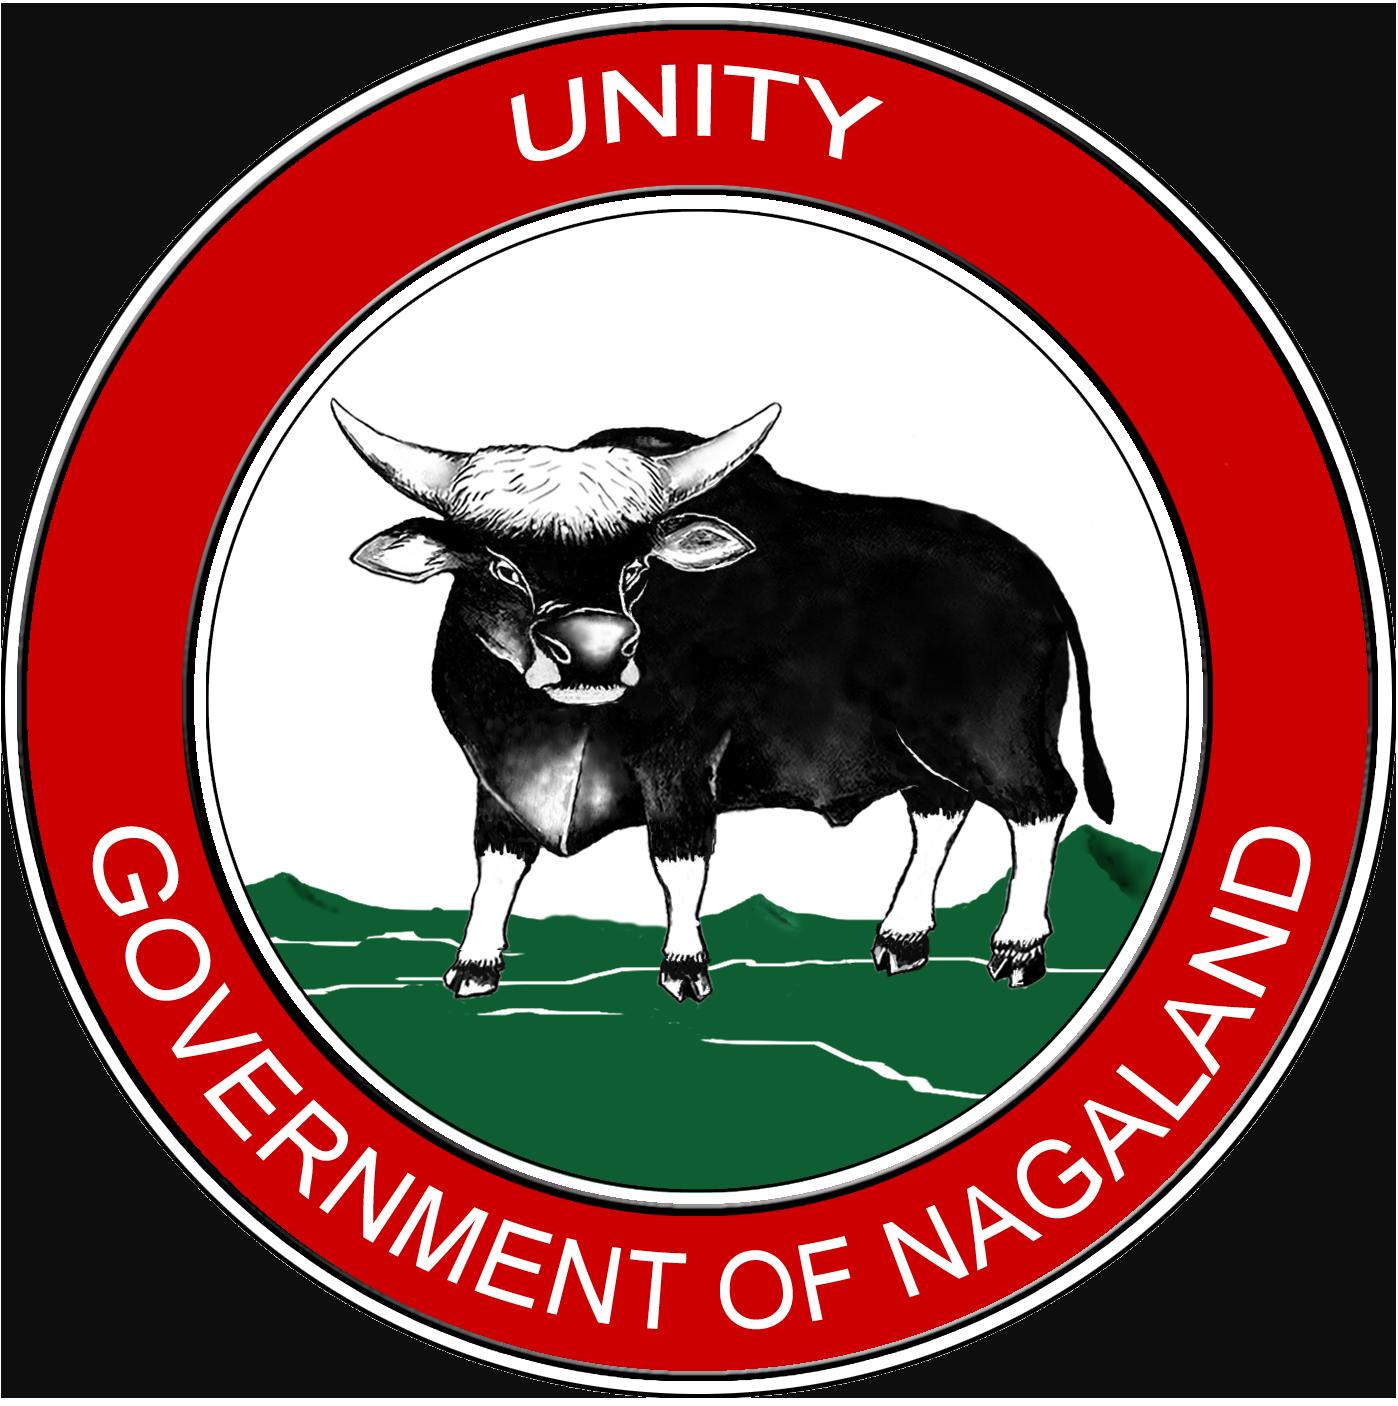 Nagaland LOGO